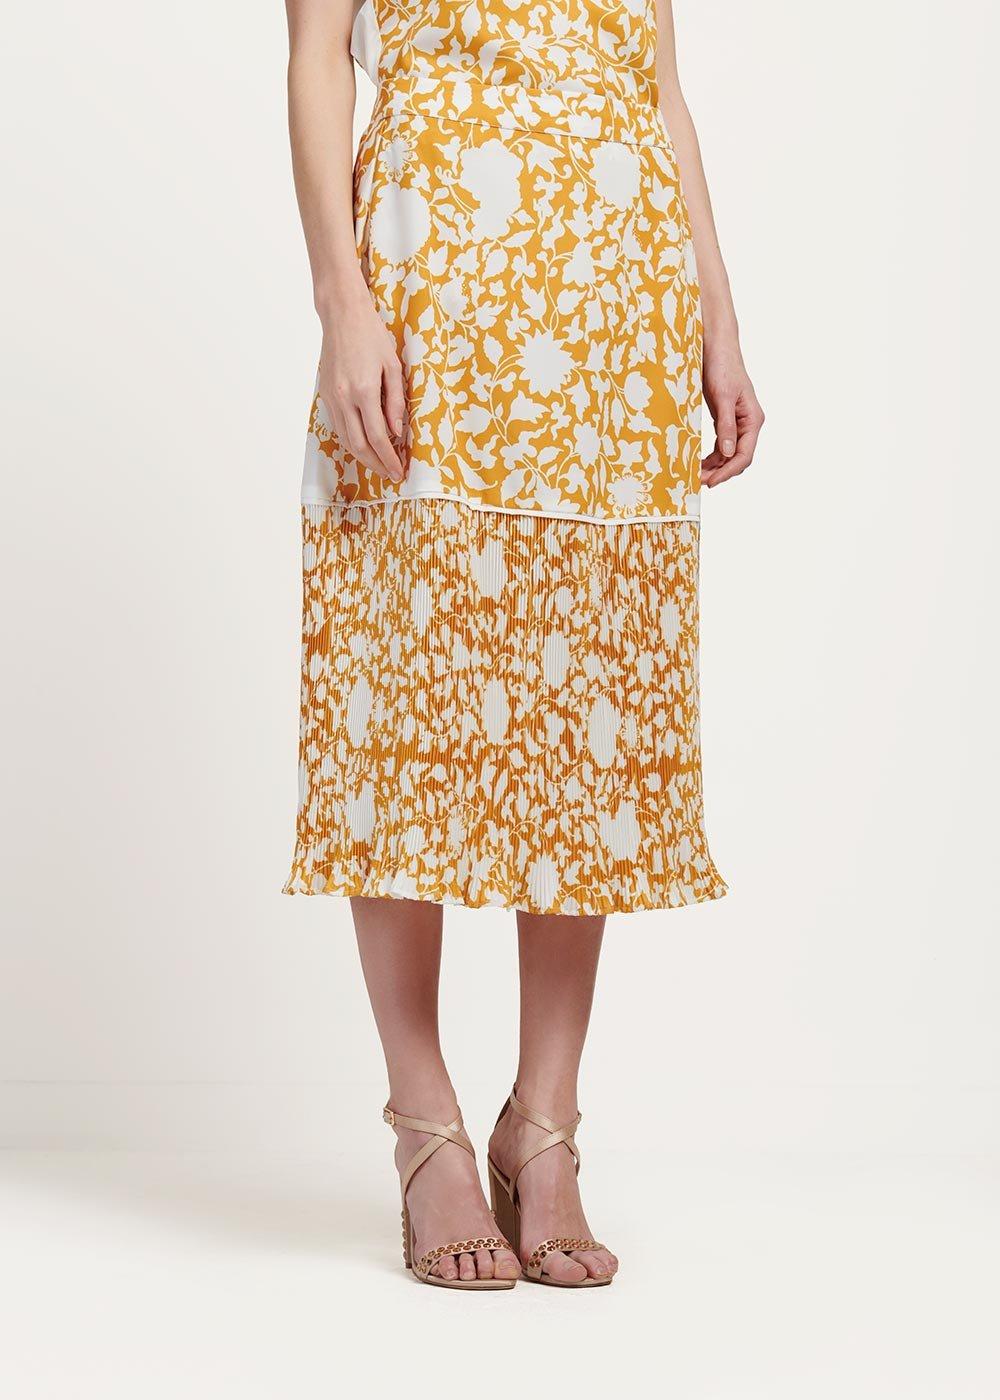 Gisel long patterned skirt - Sole\ White\ Fantasia - Woman